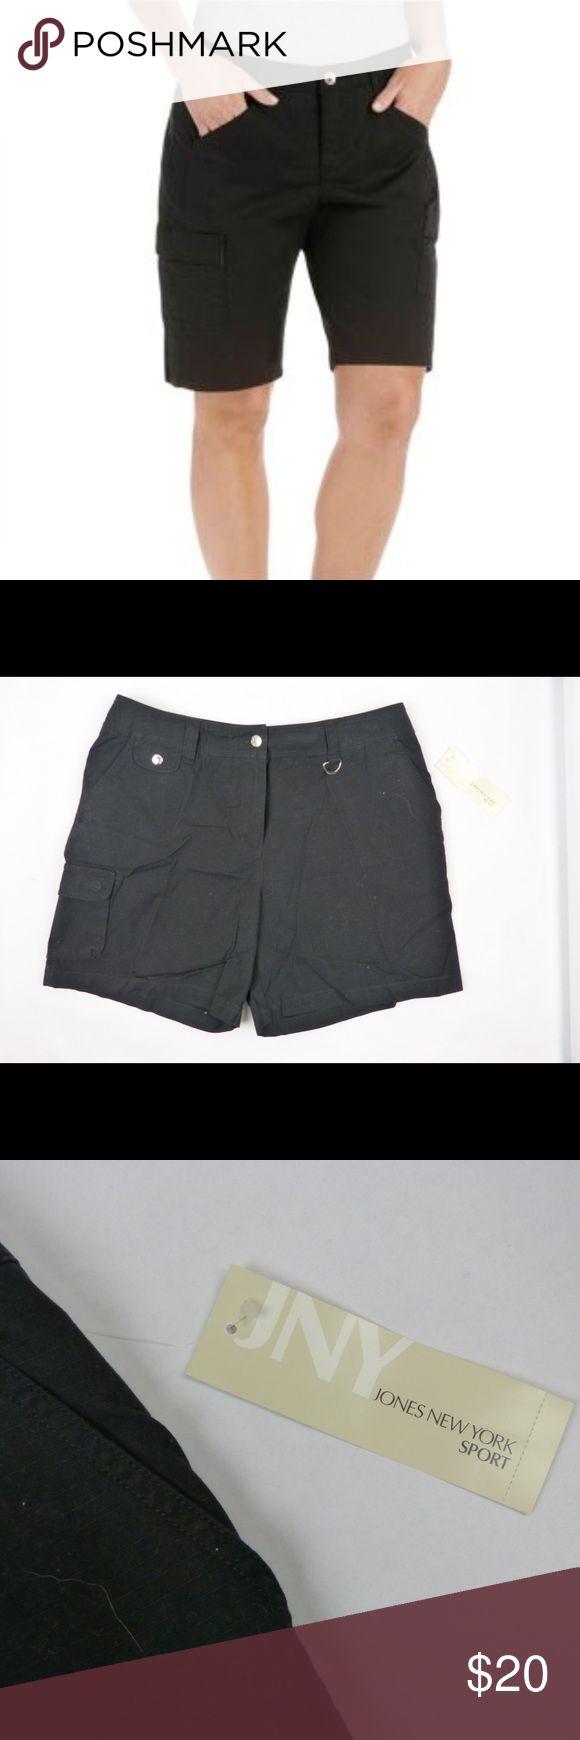 "NWT JONES NEW YORK Black Cargo Short Size 14 NWT JONES NEW YORK Black Cargo Short Size 14 Cotton 11.5"" rise 17"" across the waist  6.5"" inseam Jones New York Shorts Cargos"